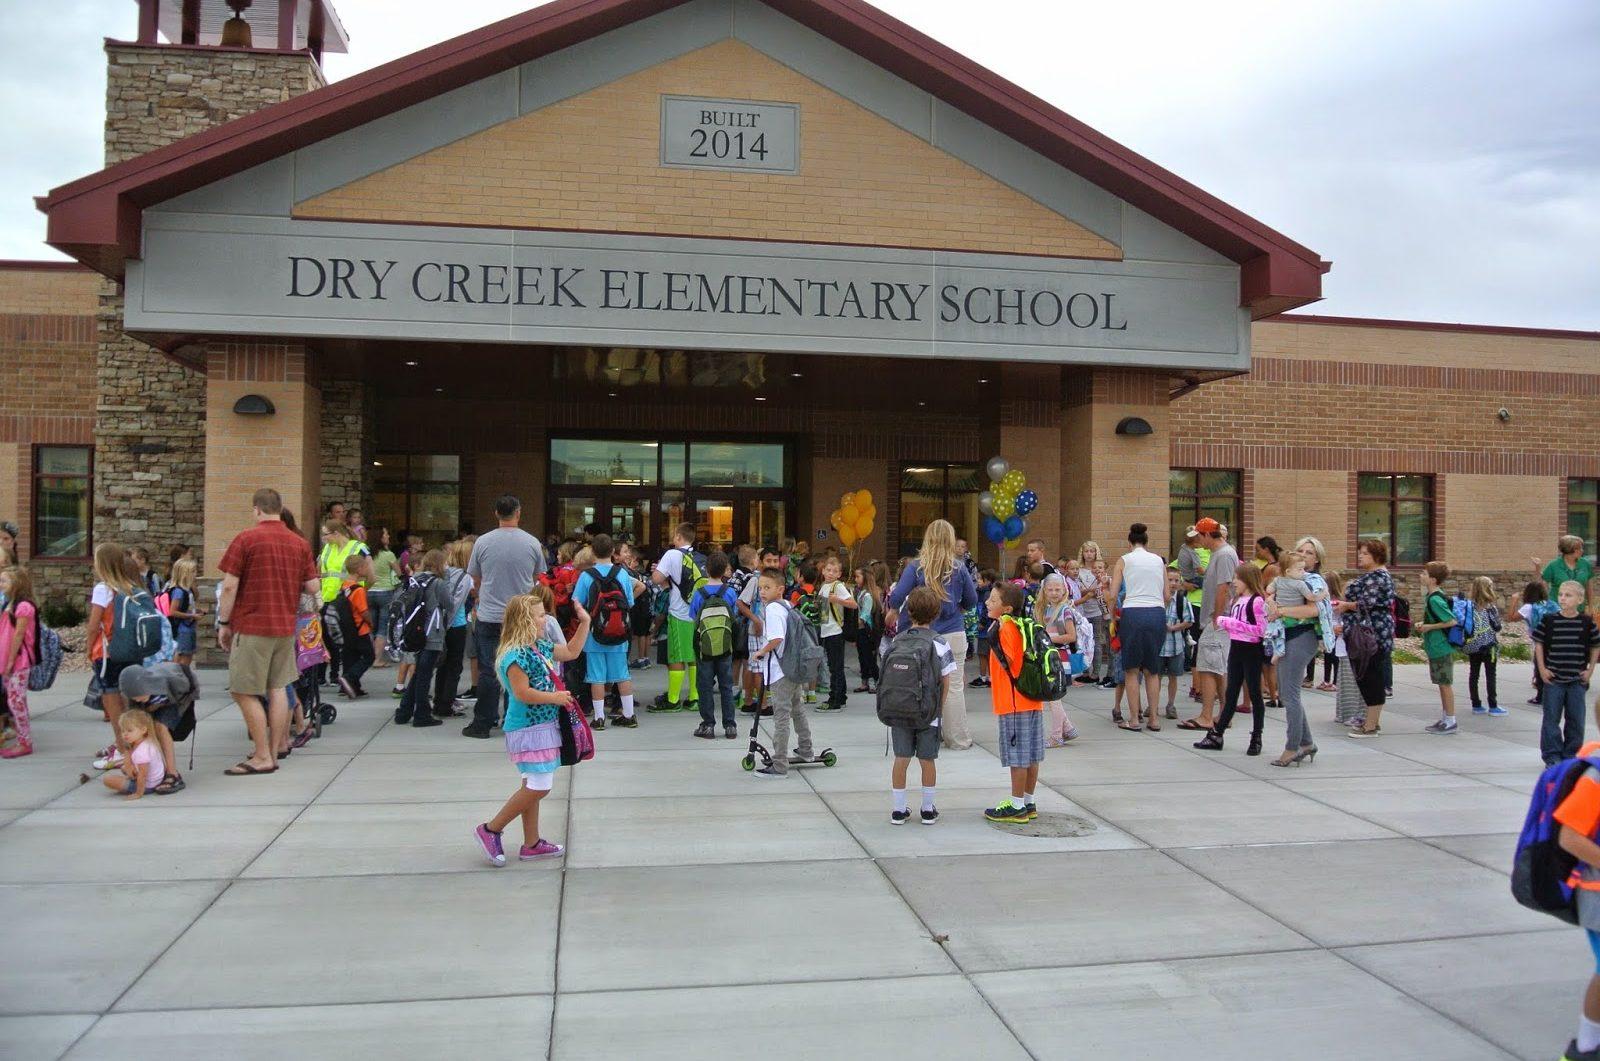 Dry Creek Elementary School, Lehi, UT